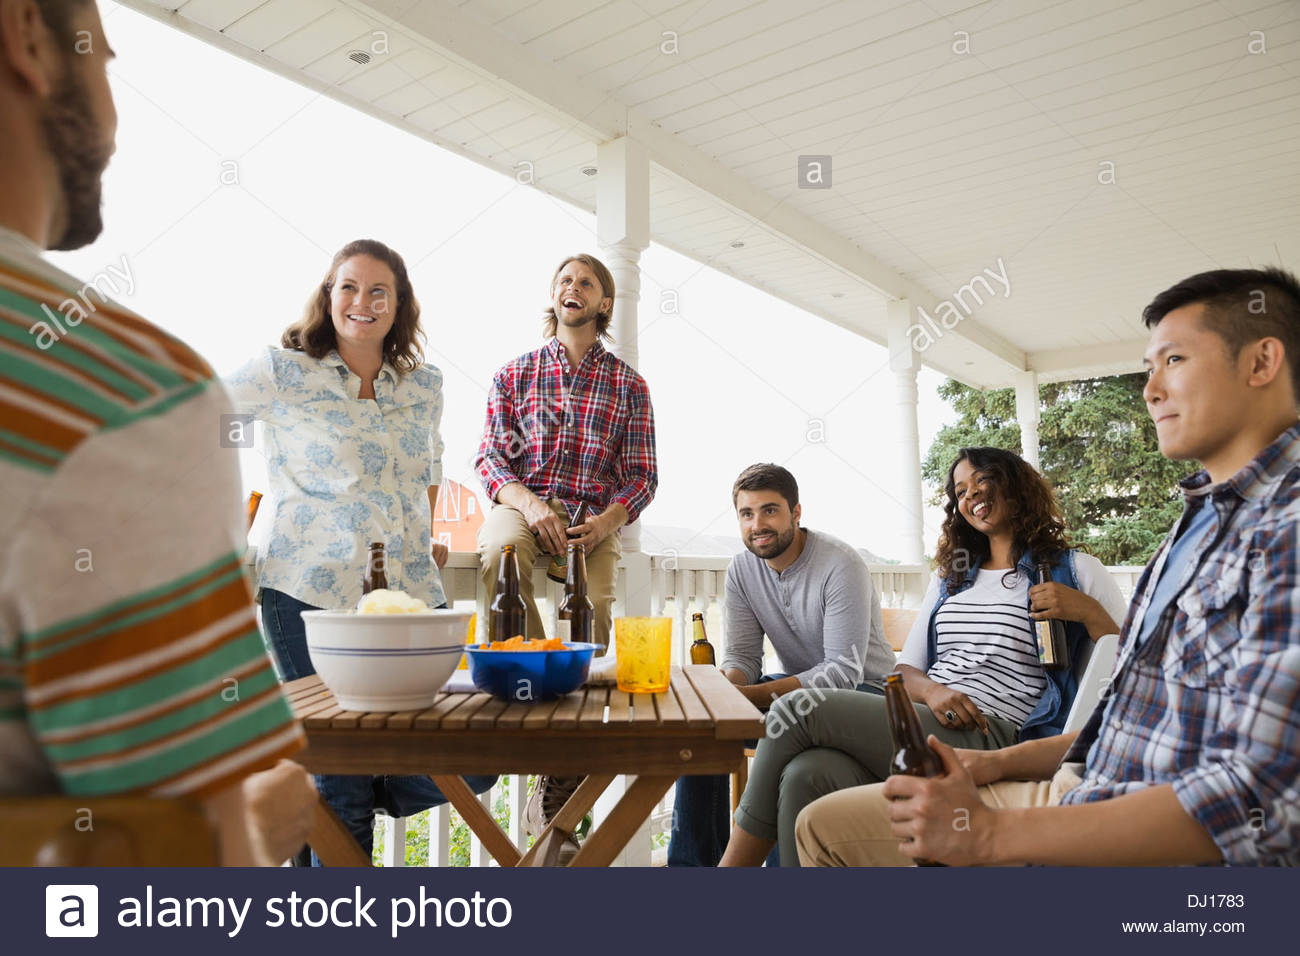 Multiethnic friends enjoying drinks on porch - Stock Image